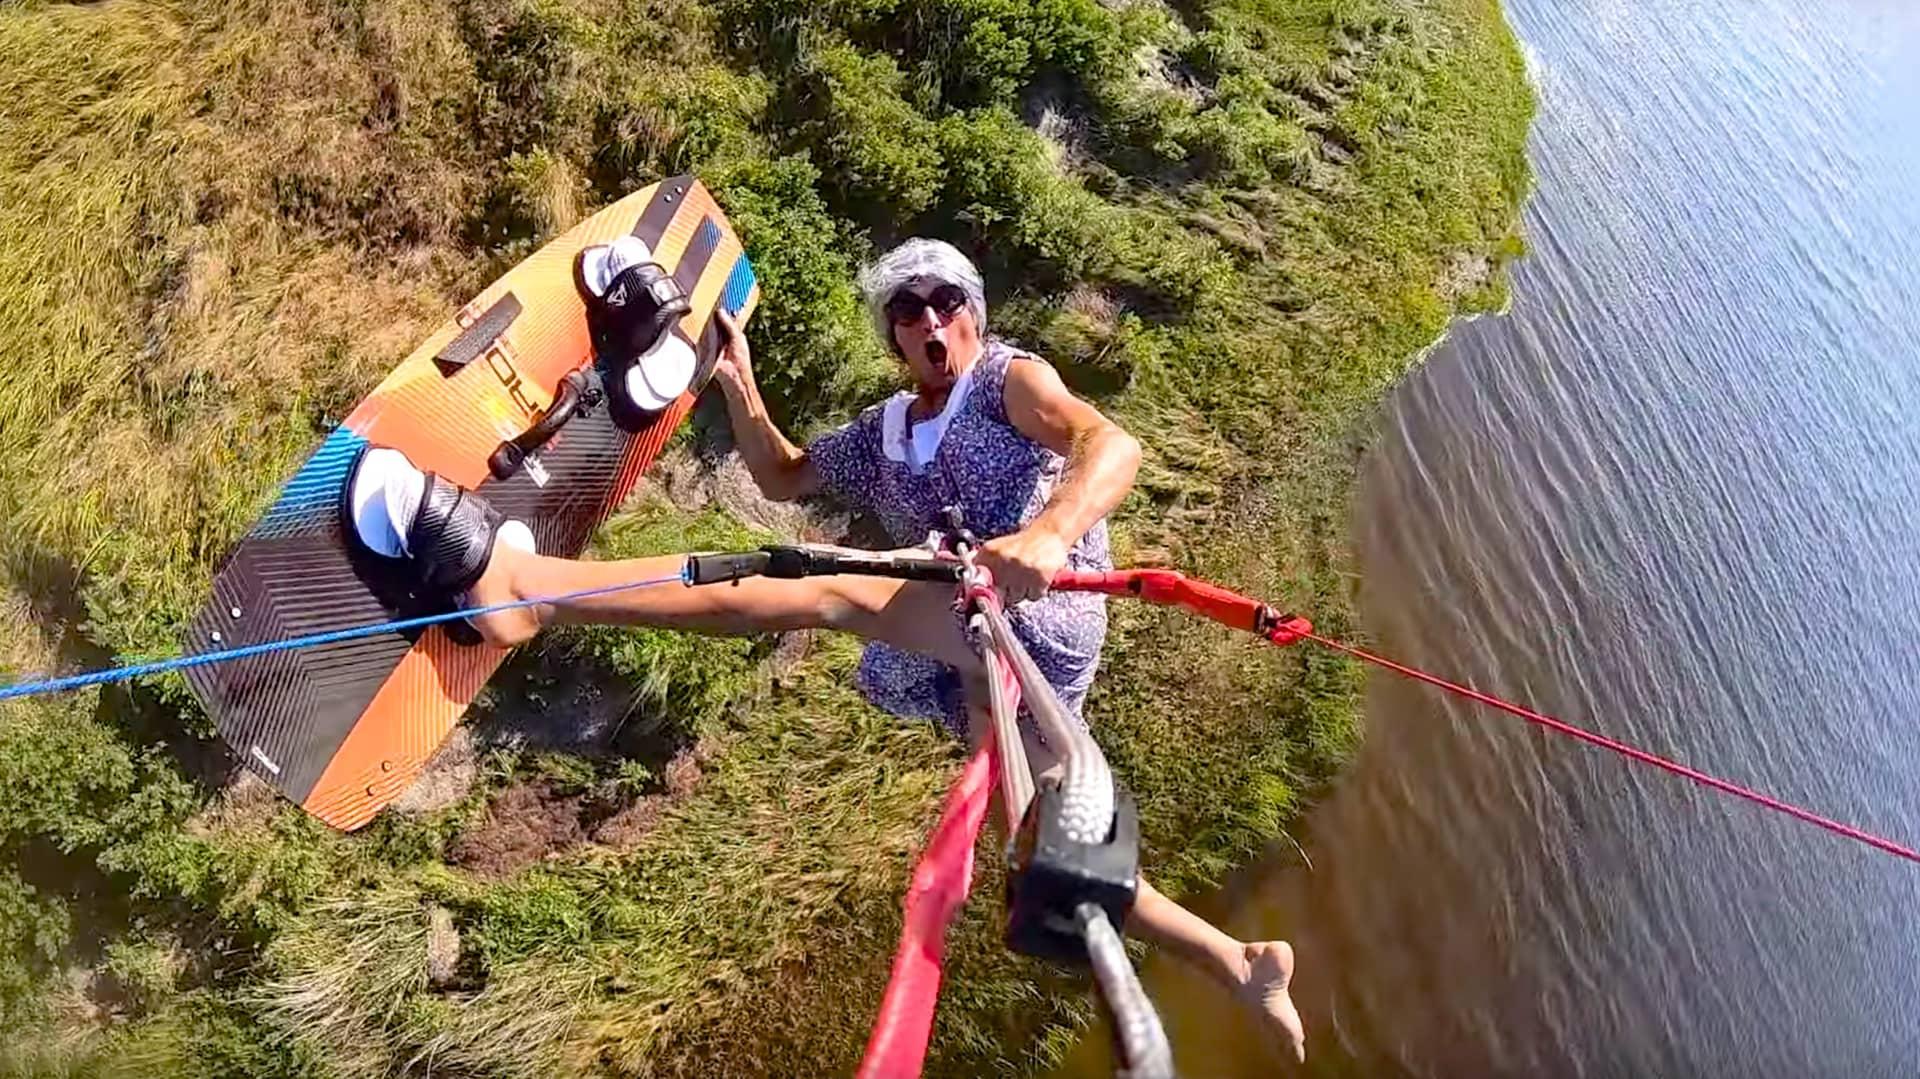 Granny De is back kiteboarding - with Epic Kites Kiteboarding